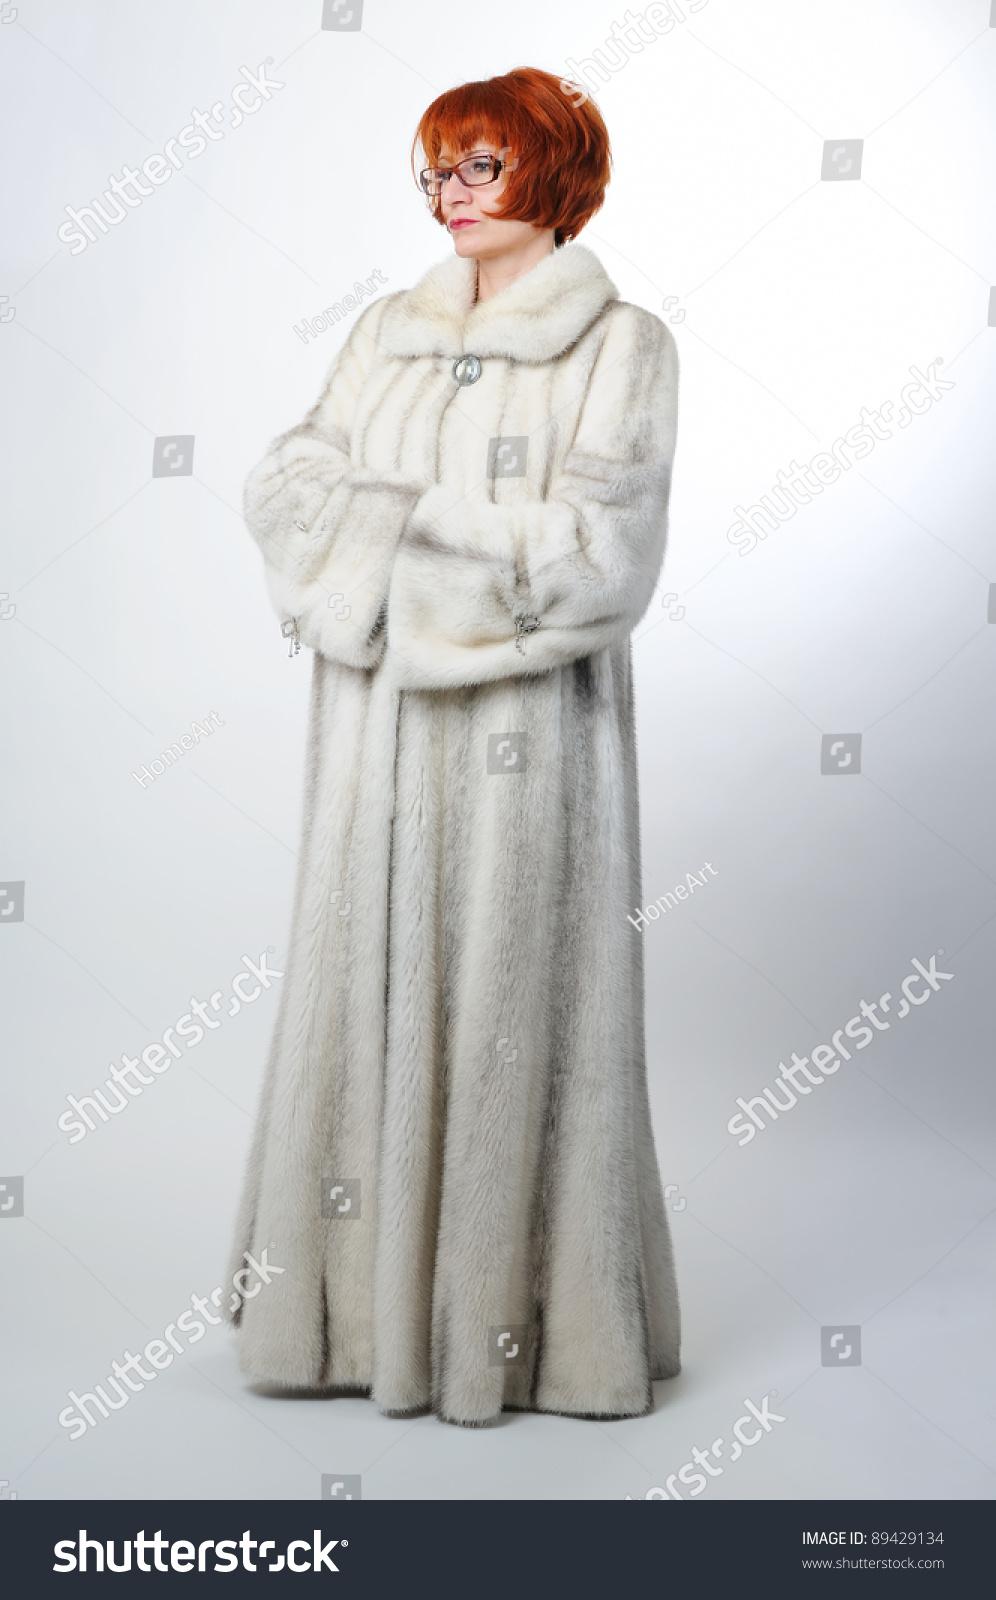 Mink Coat Value >> Woman In White Mink Long Fur Coat Stock Photo 89429134 ...